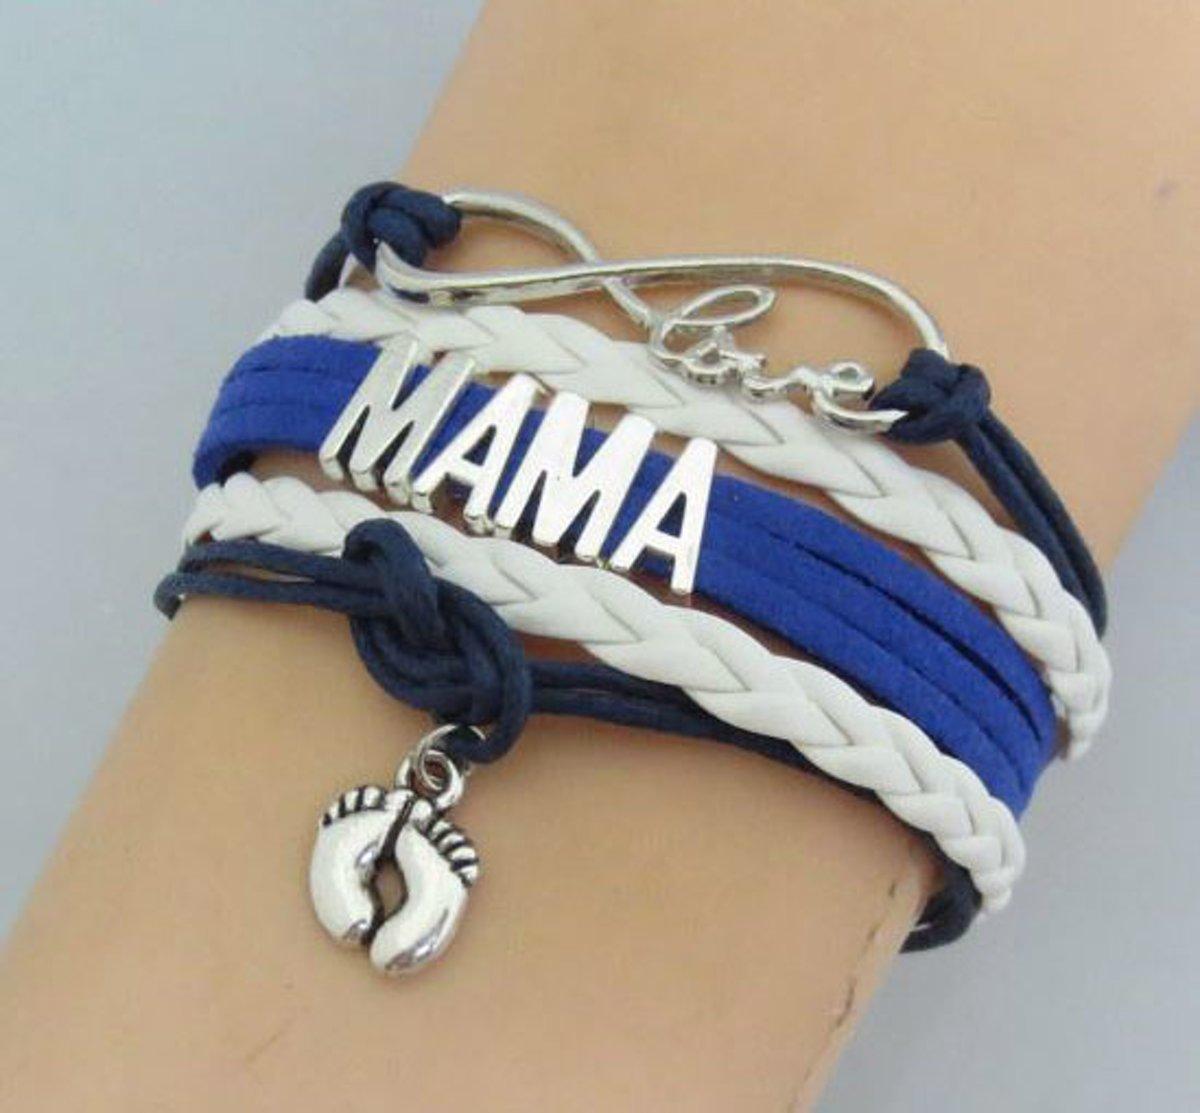 Stoere wikkelarmband mama blue - mama armband - moederdagcadeau - geschenk moederdag - kraamcadeau sieraad kopen